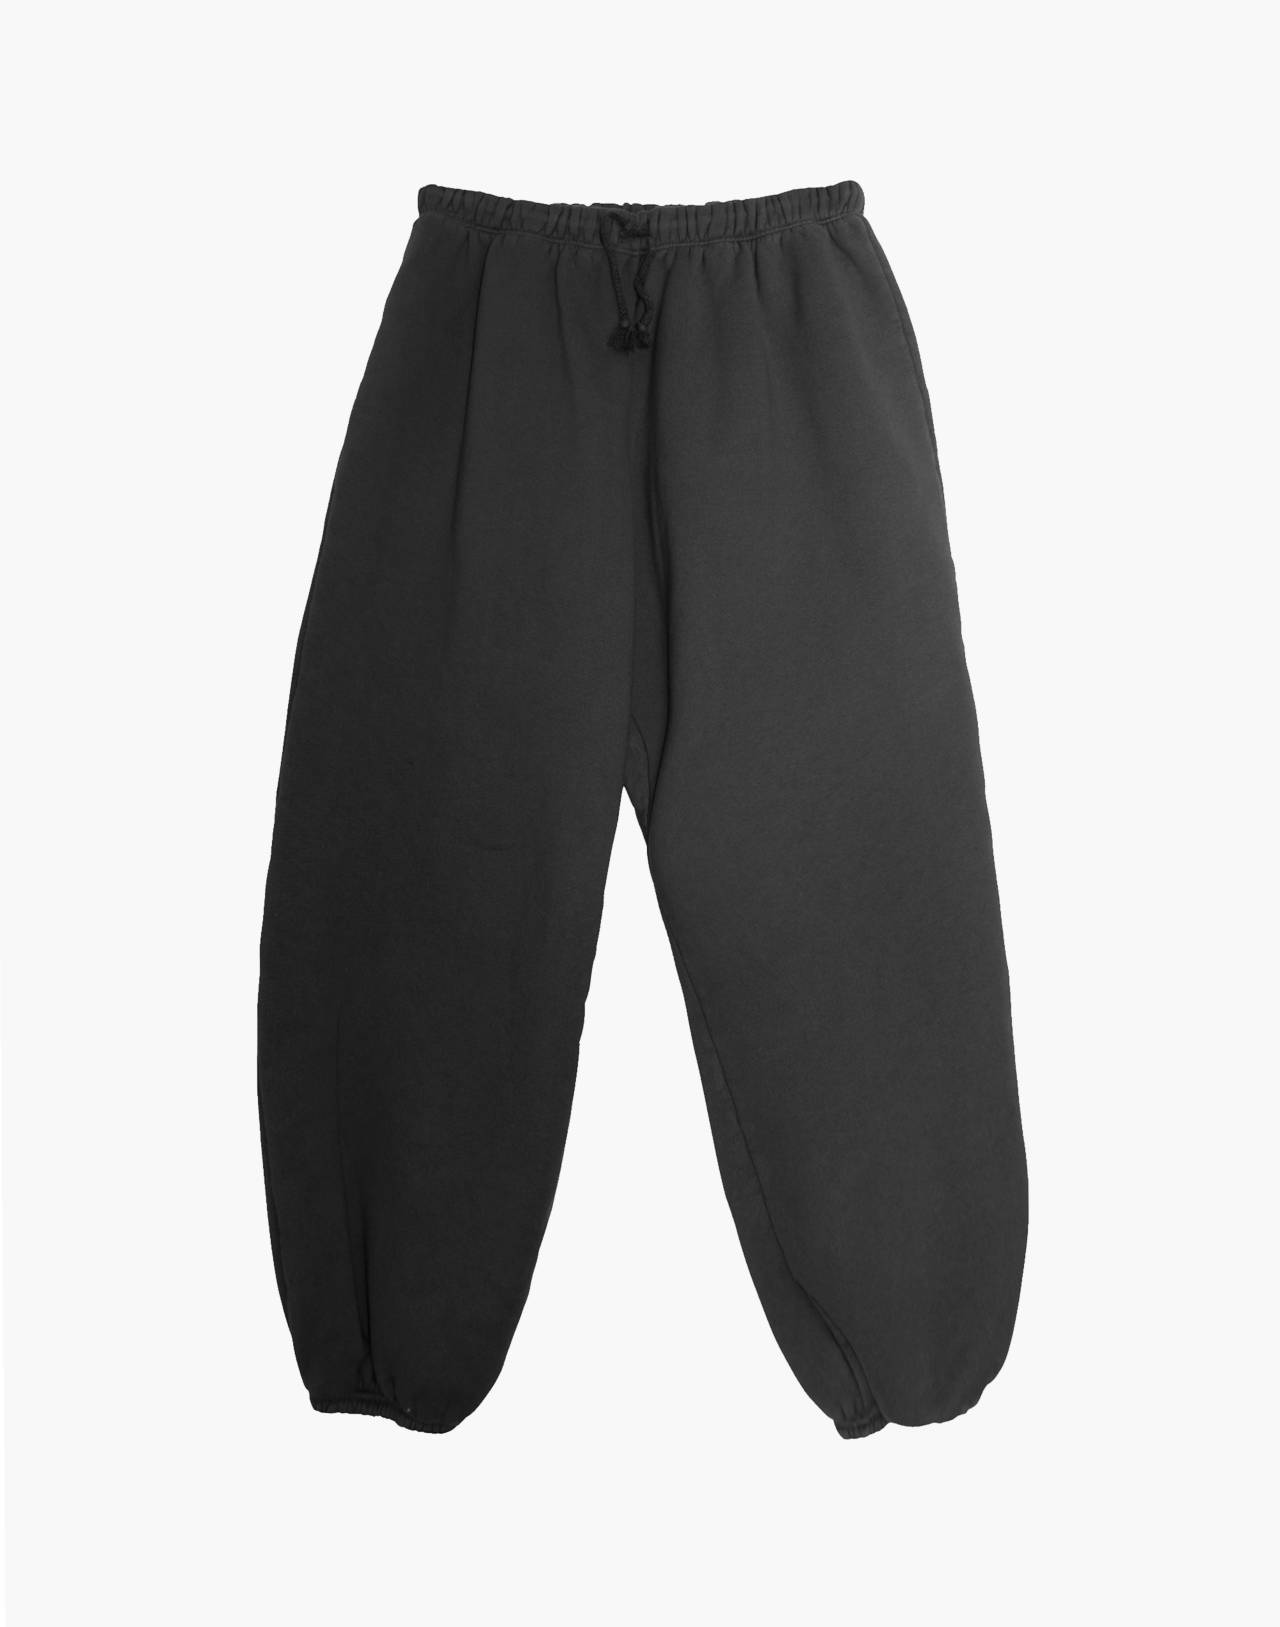 NICO NICO™ Simon Fleece Sweatpants in black image 1